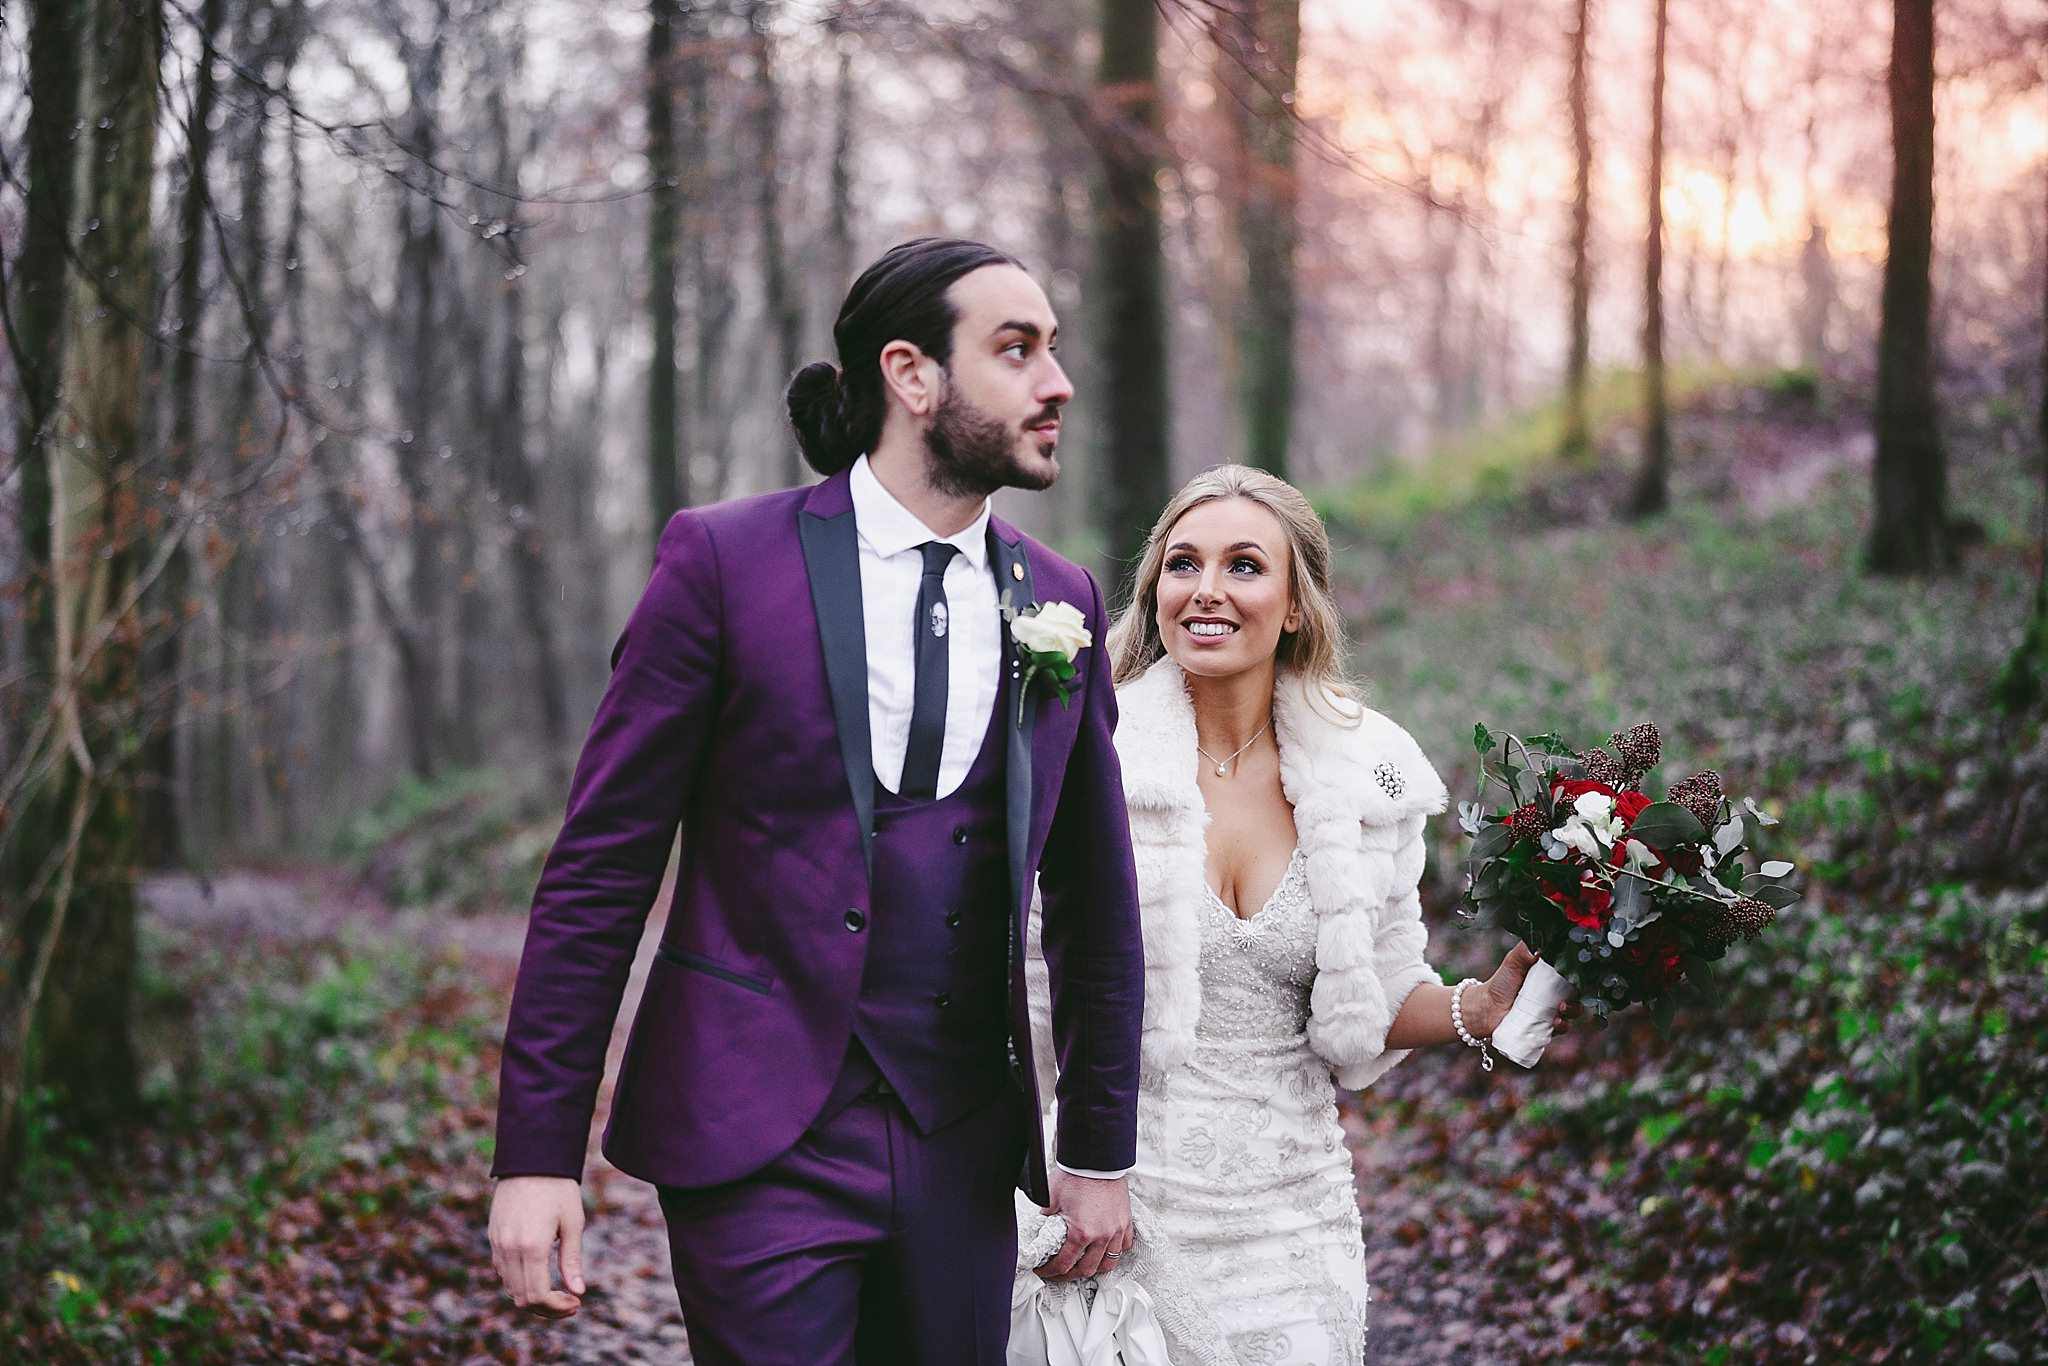 aga-tomaszek-wedding-photographer-cardiff-2016_1048